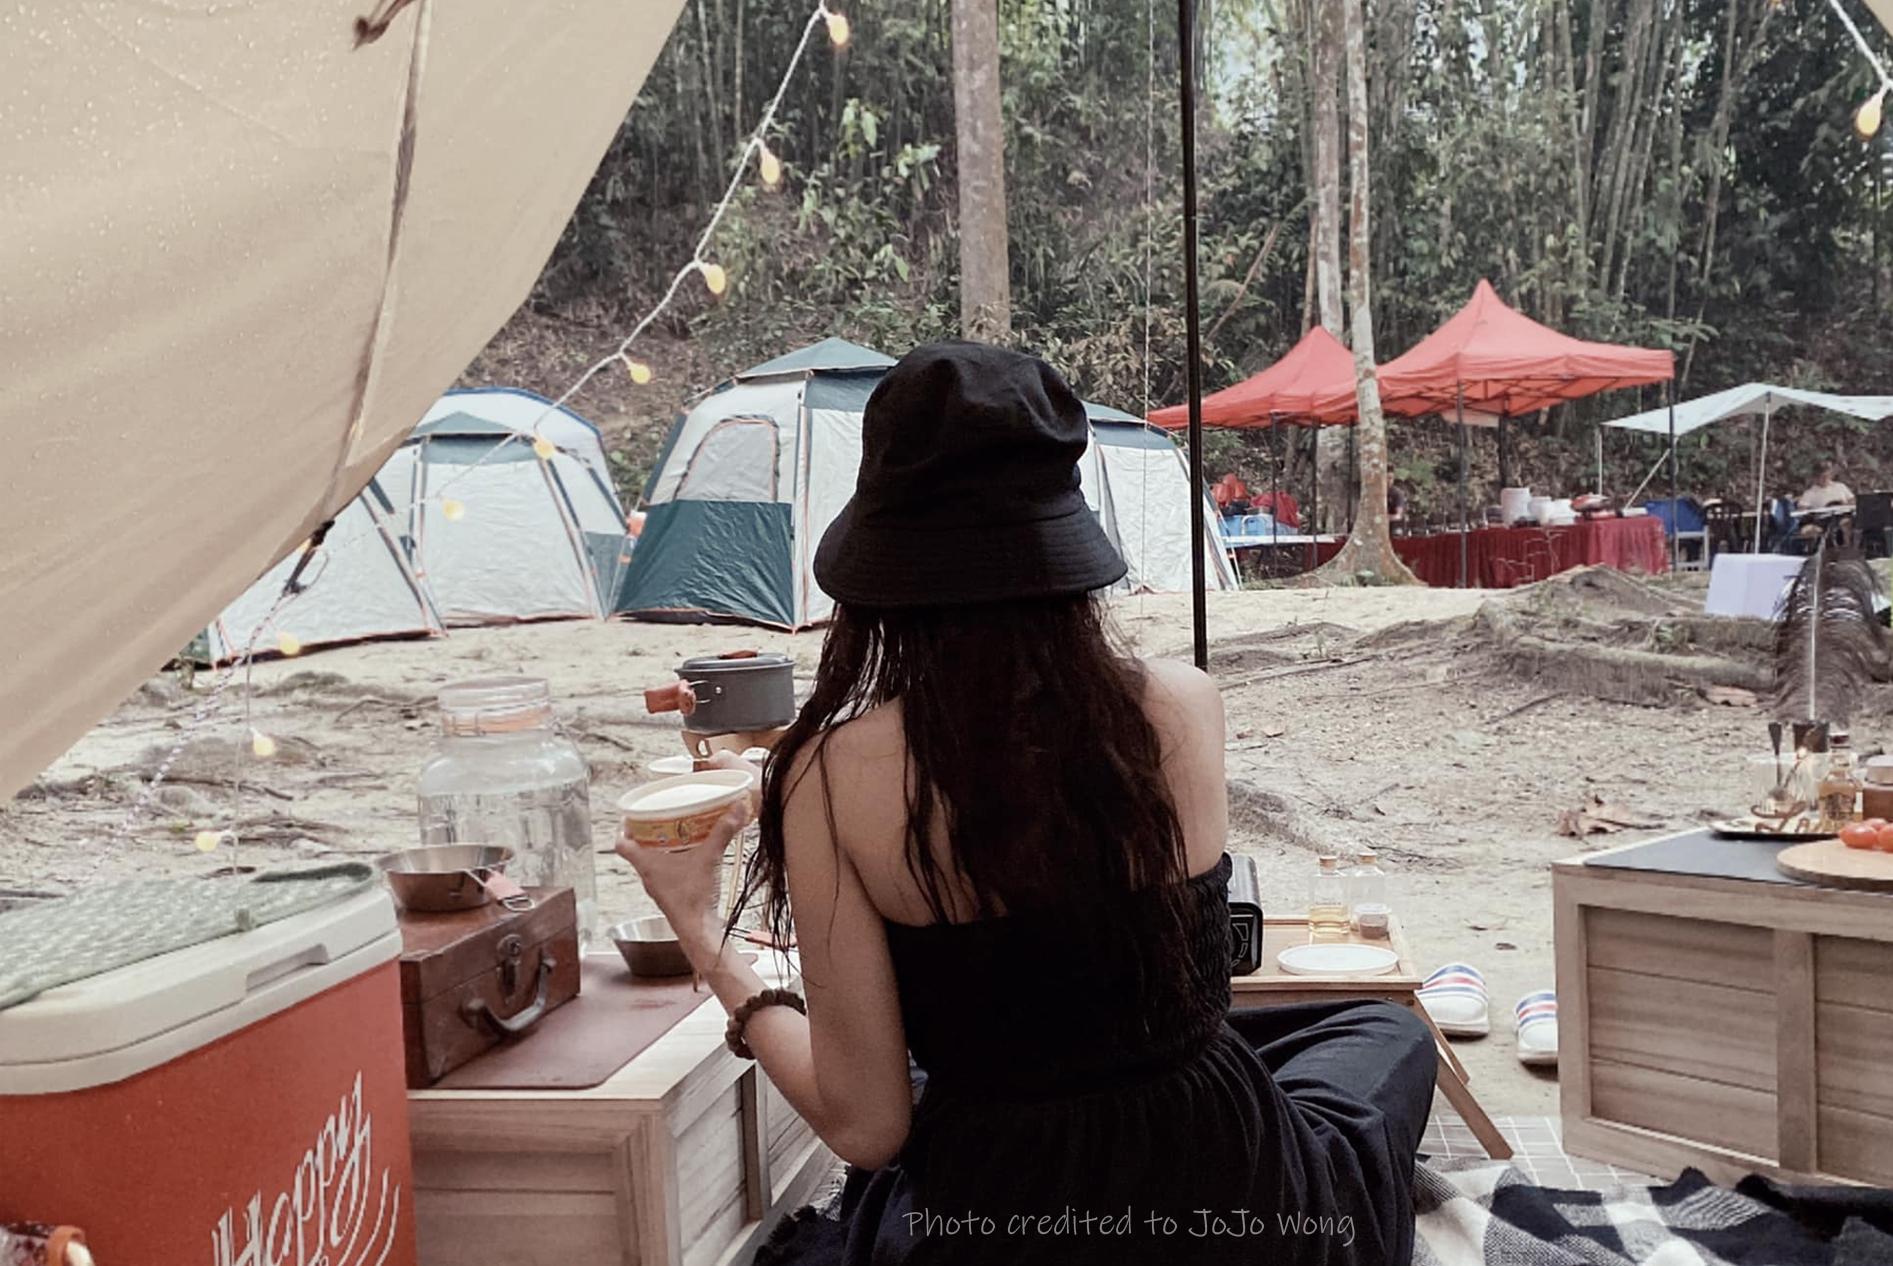 Resort_Taman_Rimba_Komanwel_Rawang_campsite_malaysia_car_camping_private_event_organizer-11